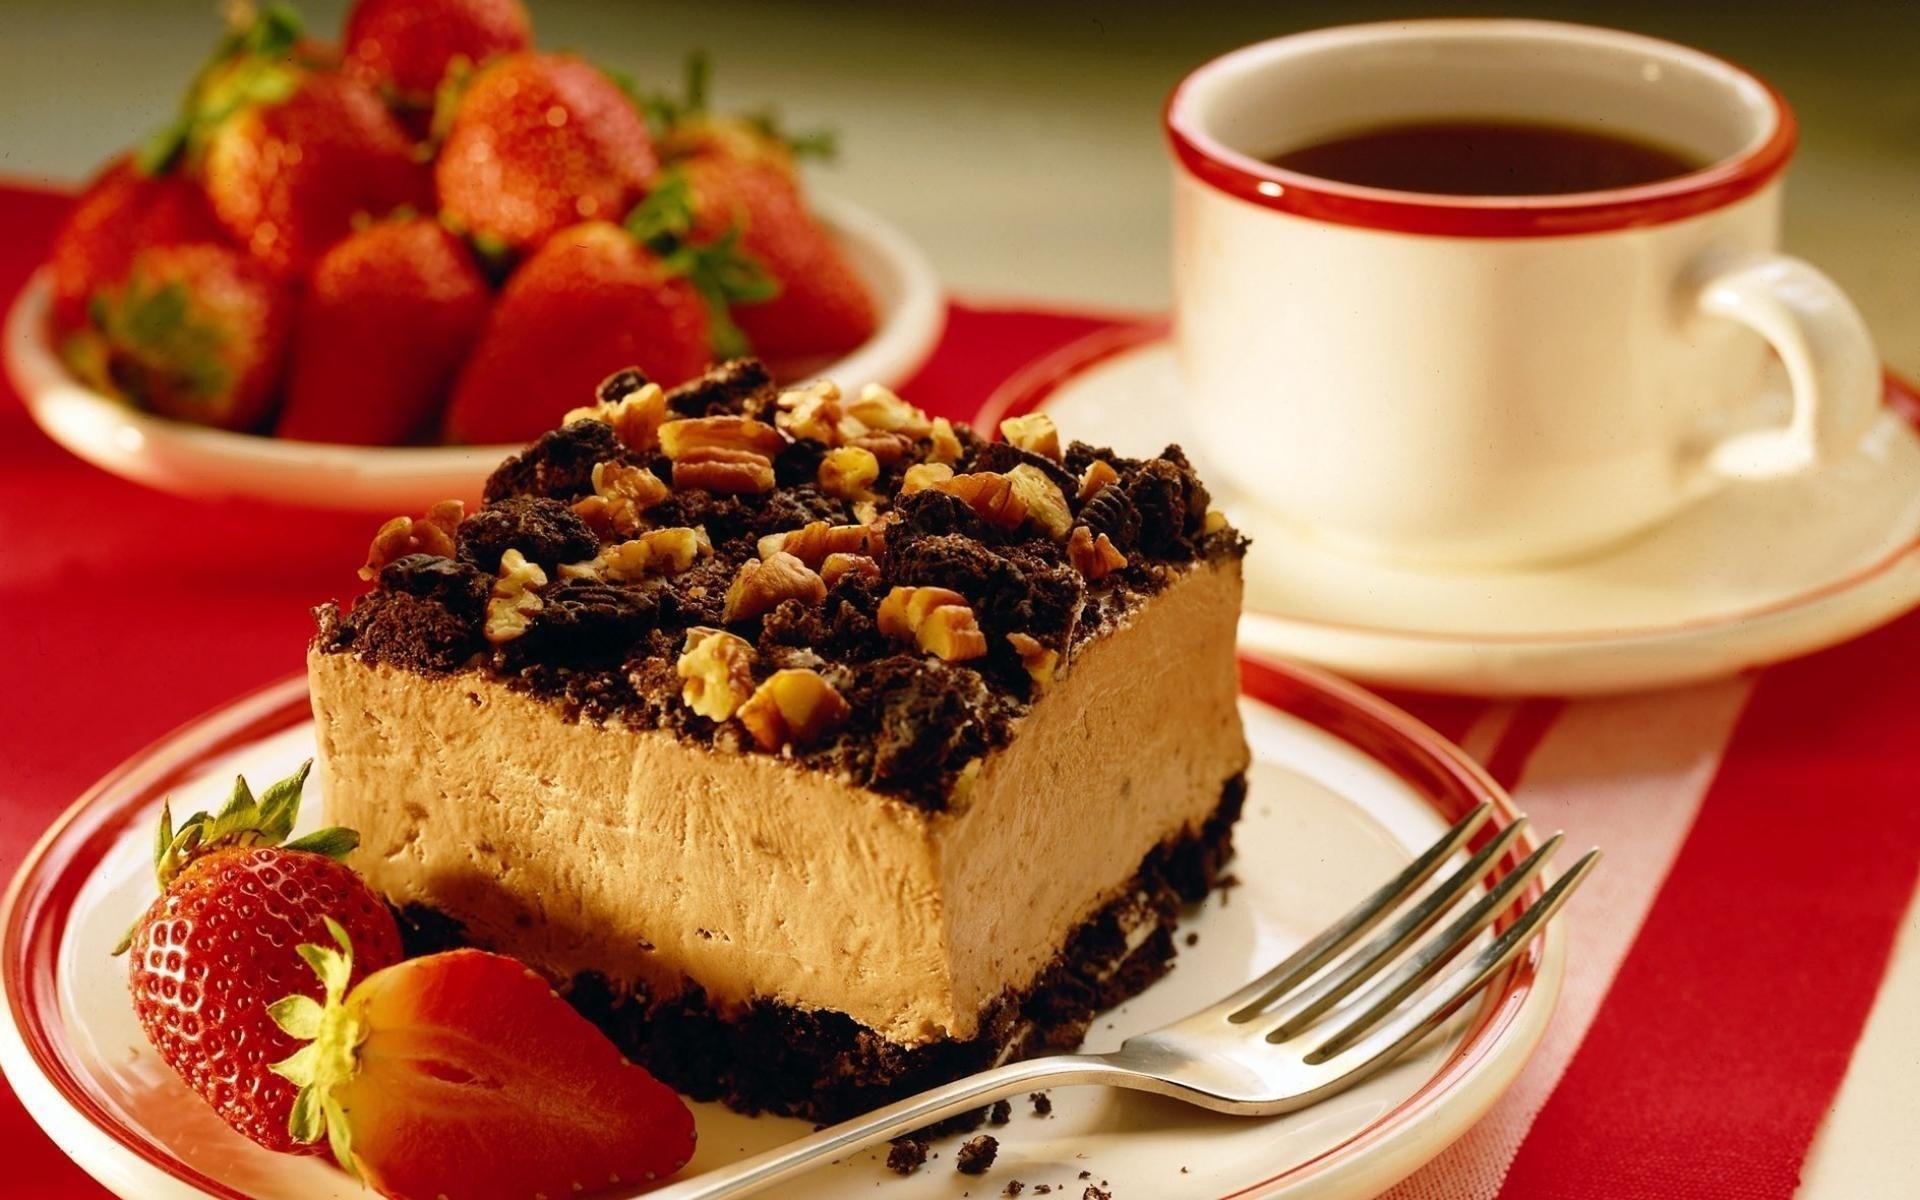 Coffee Food Cake Desserts Wallpaper 1920x1200